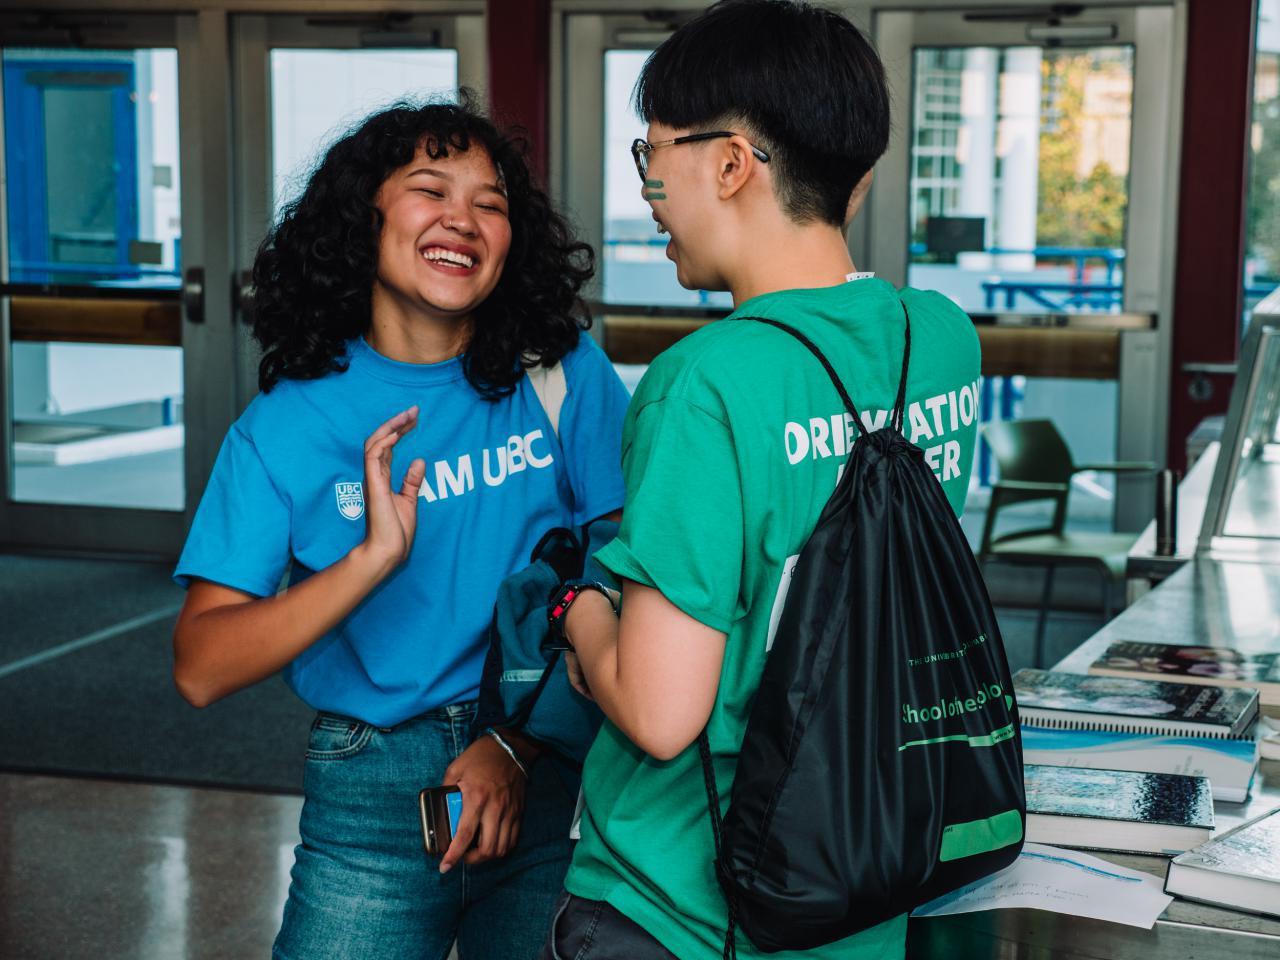 UBC-Imagine-Day-2018-Kinesiology-2.jpg